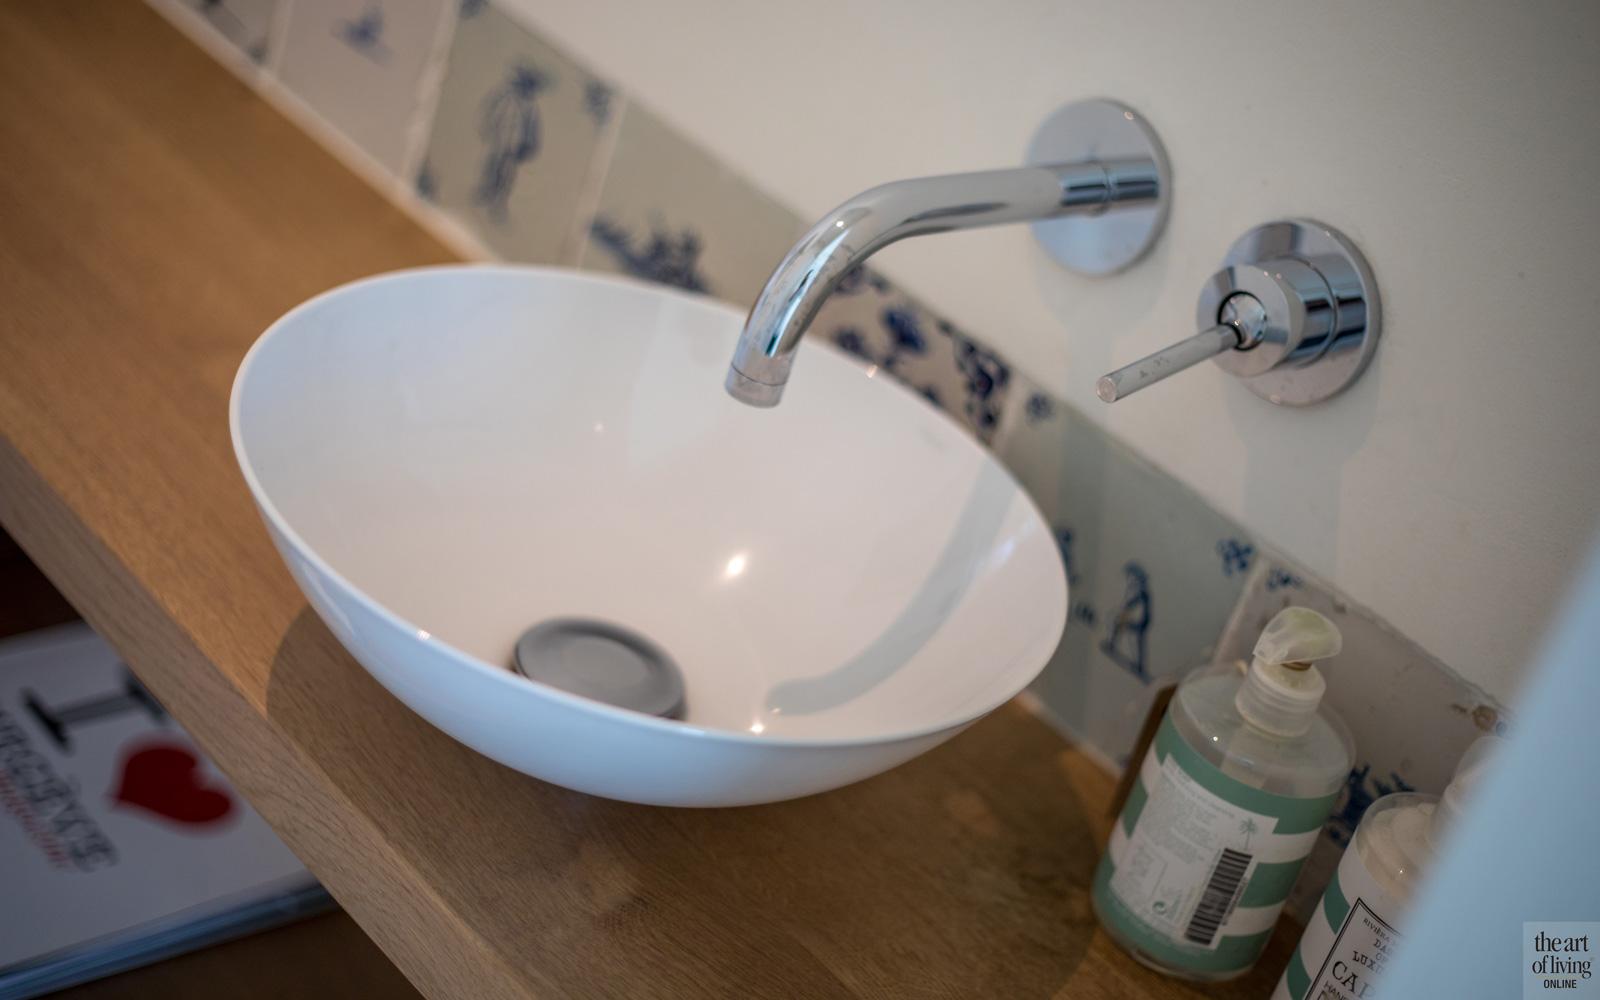 Wastafel, waskom, Alape, badkamer, sanitair, woning in L-vorm, VVR Architecten